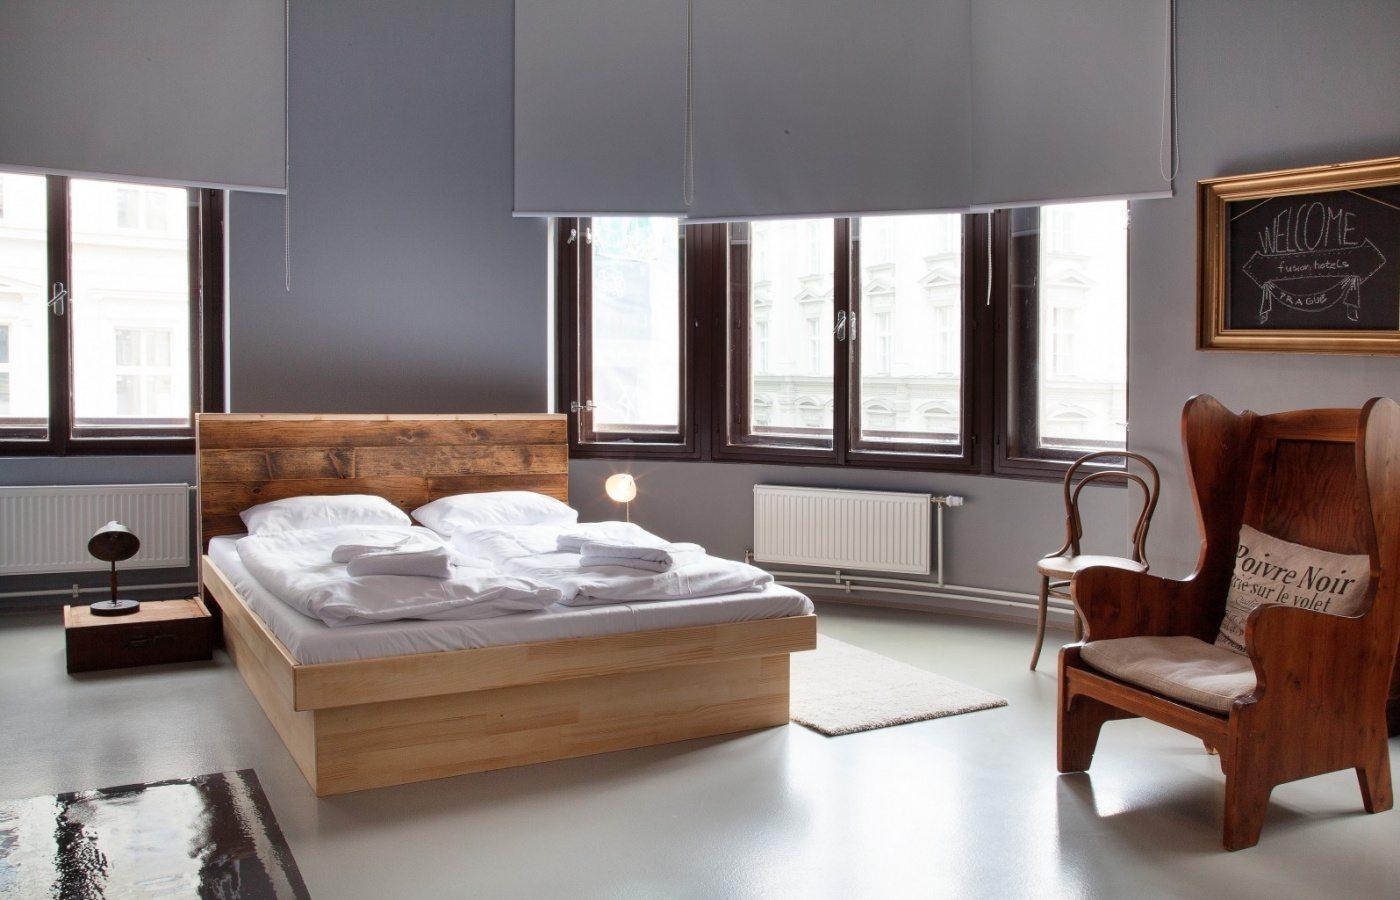 fusion hotel vintage room pragues coolest luxury boutique hotel